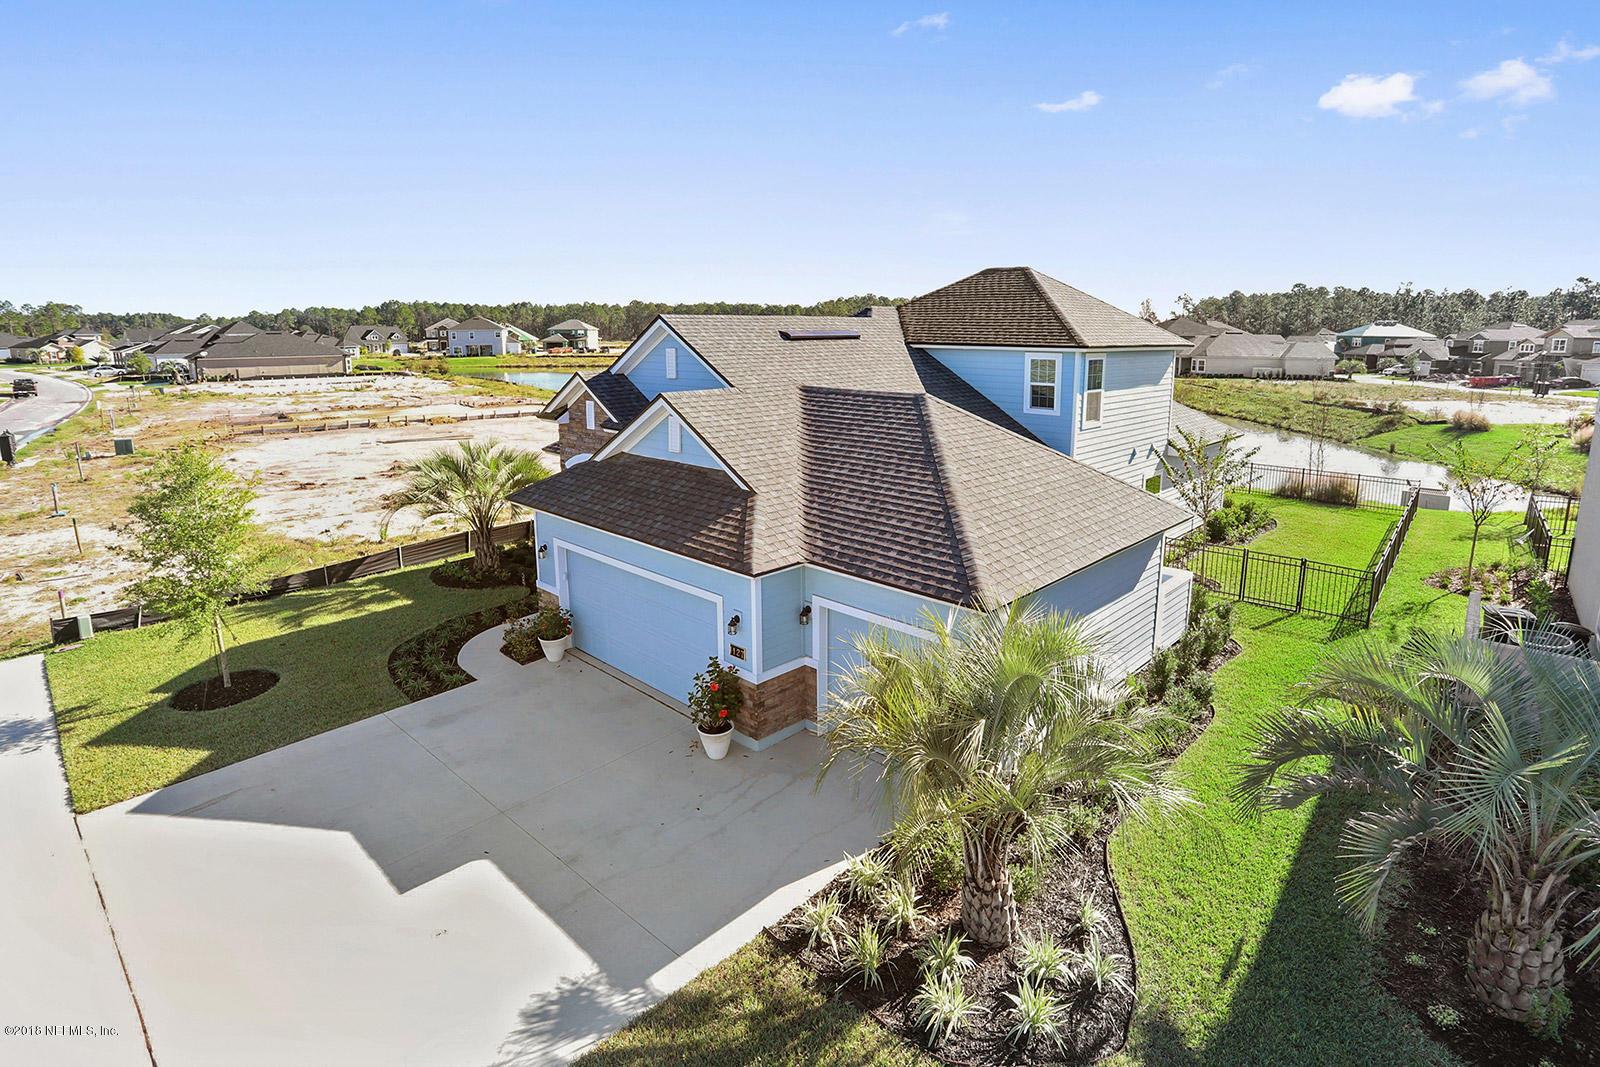 1127 LAUREL VALLEY, ORANGE PARK, FLORIDA 32065, 4 Bedrooms Bedrooms, ,3 BathroomsBathrooms,Residential - single family,For sale,LAUREL VALLEY,967743